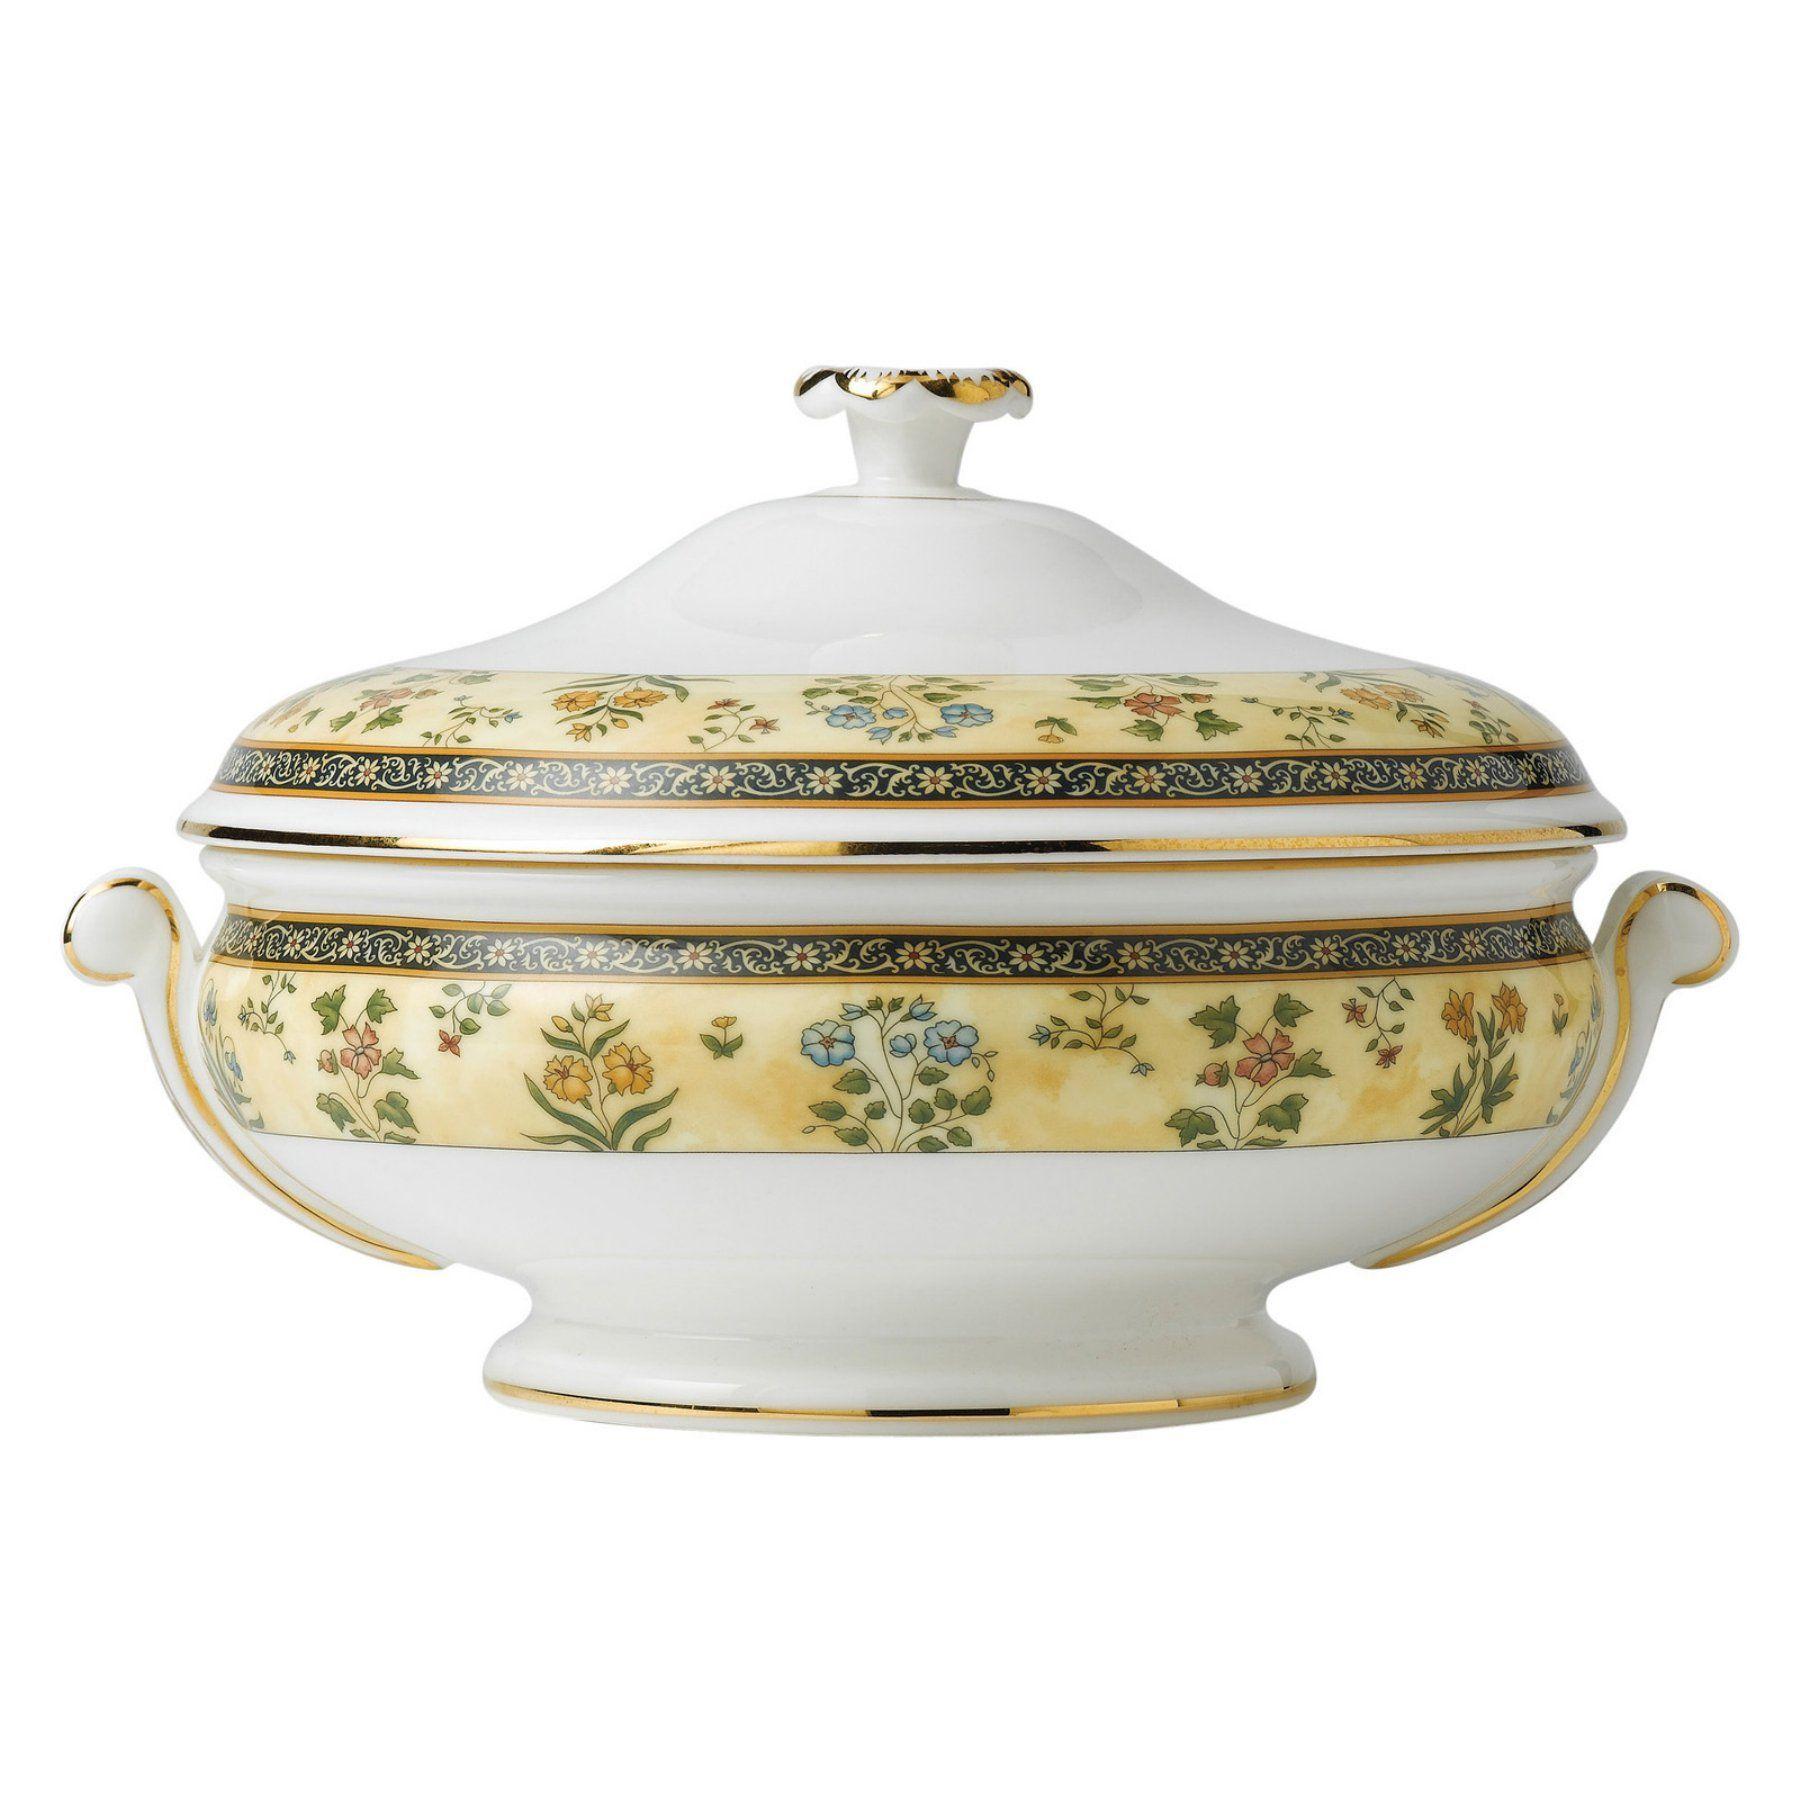 Wedgwood India Covered Vegetable Bowl - 50193206139